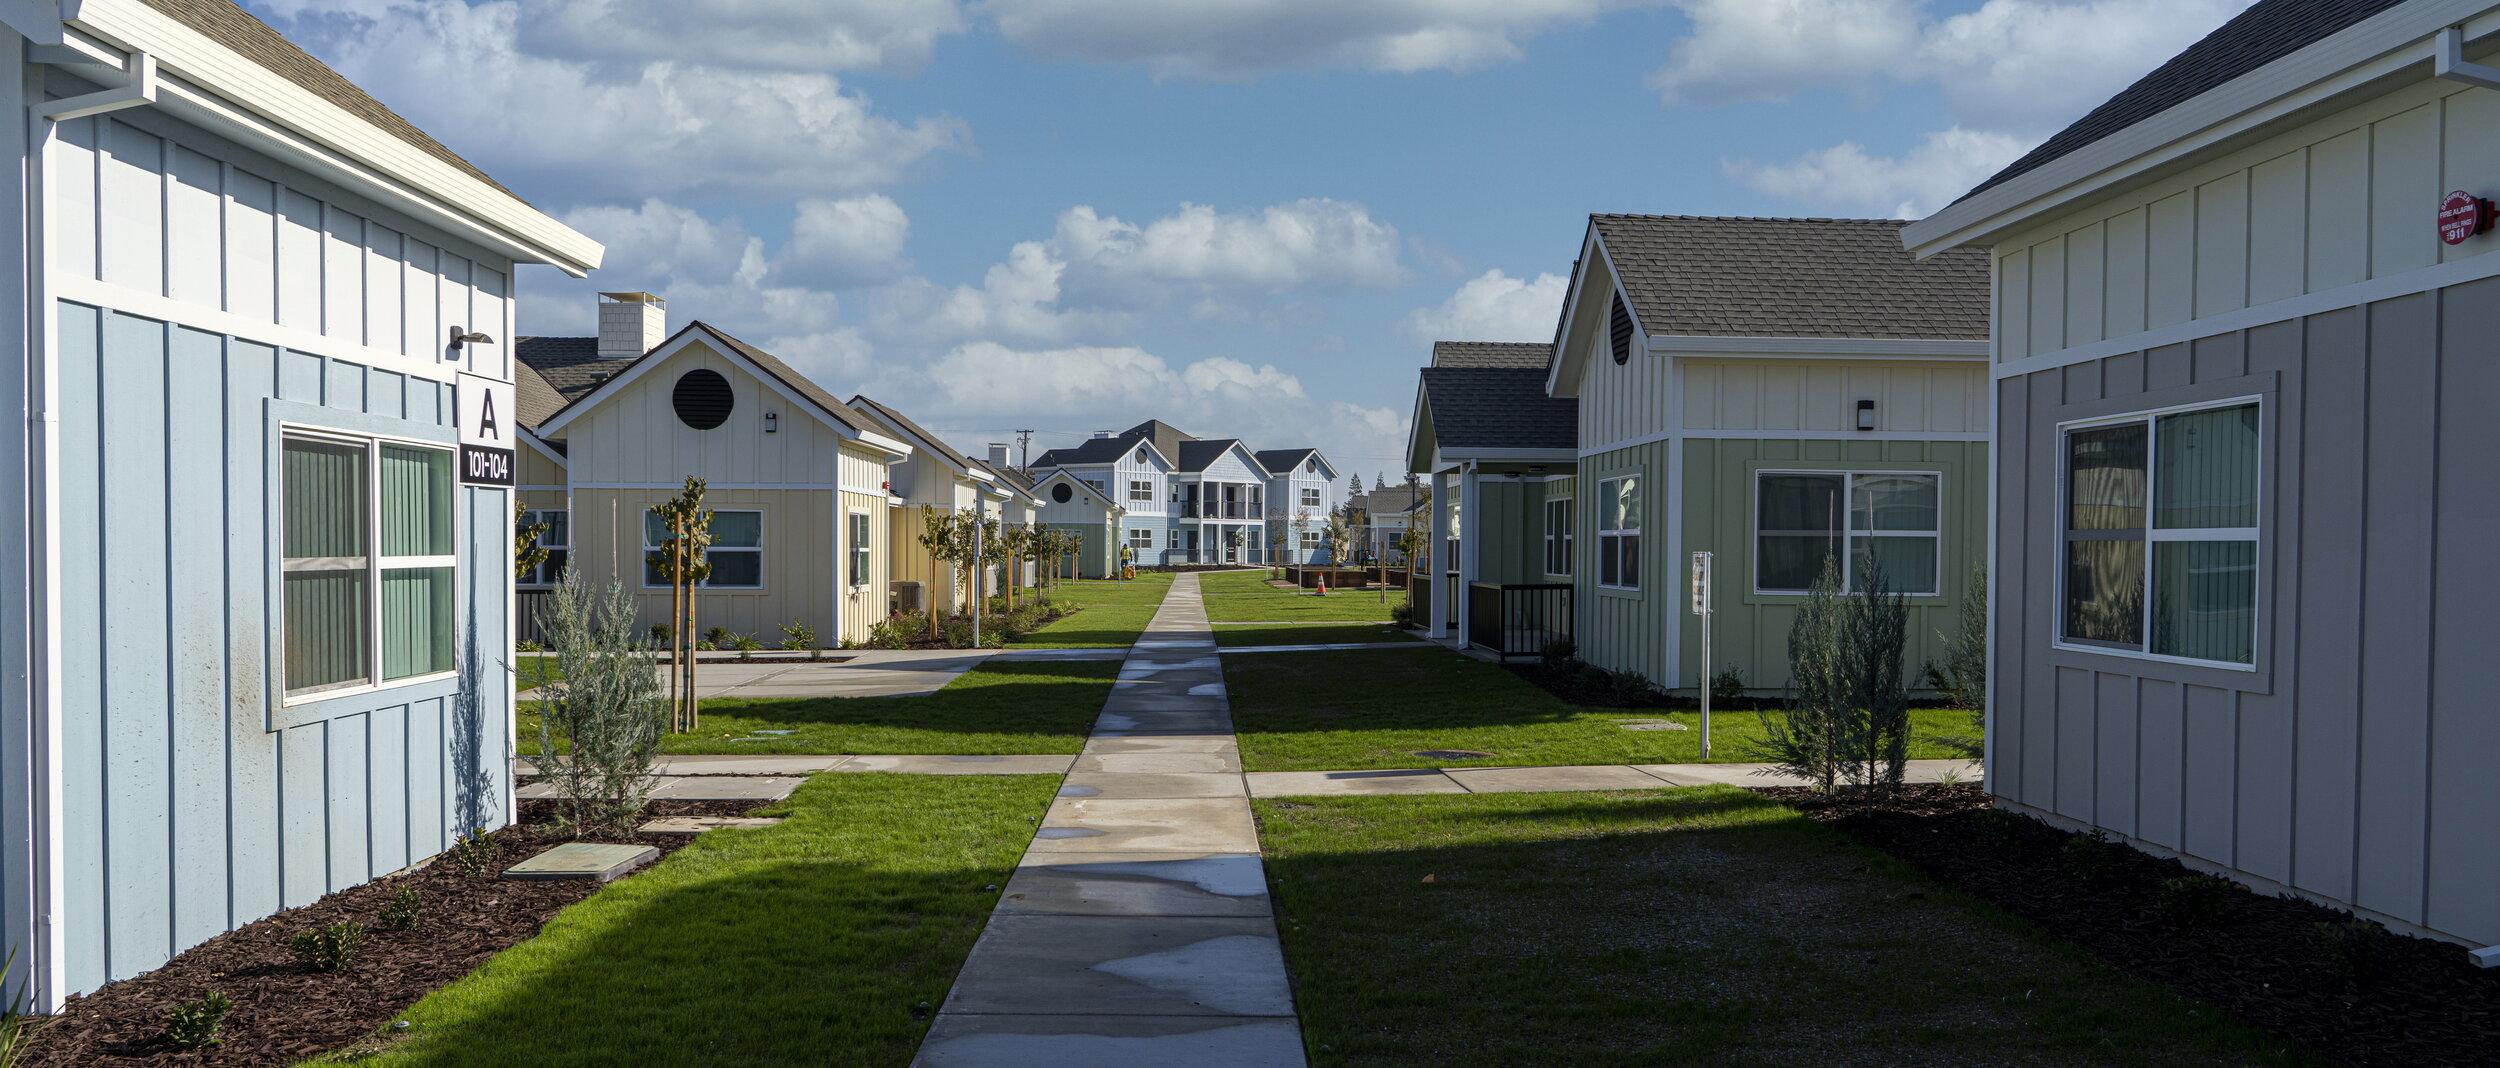 Image of Cottage Village Senior Apartments